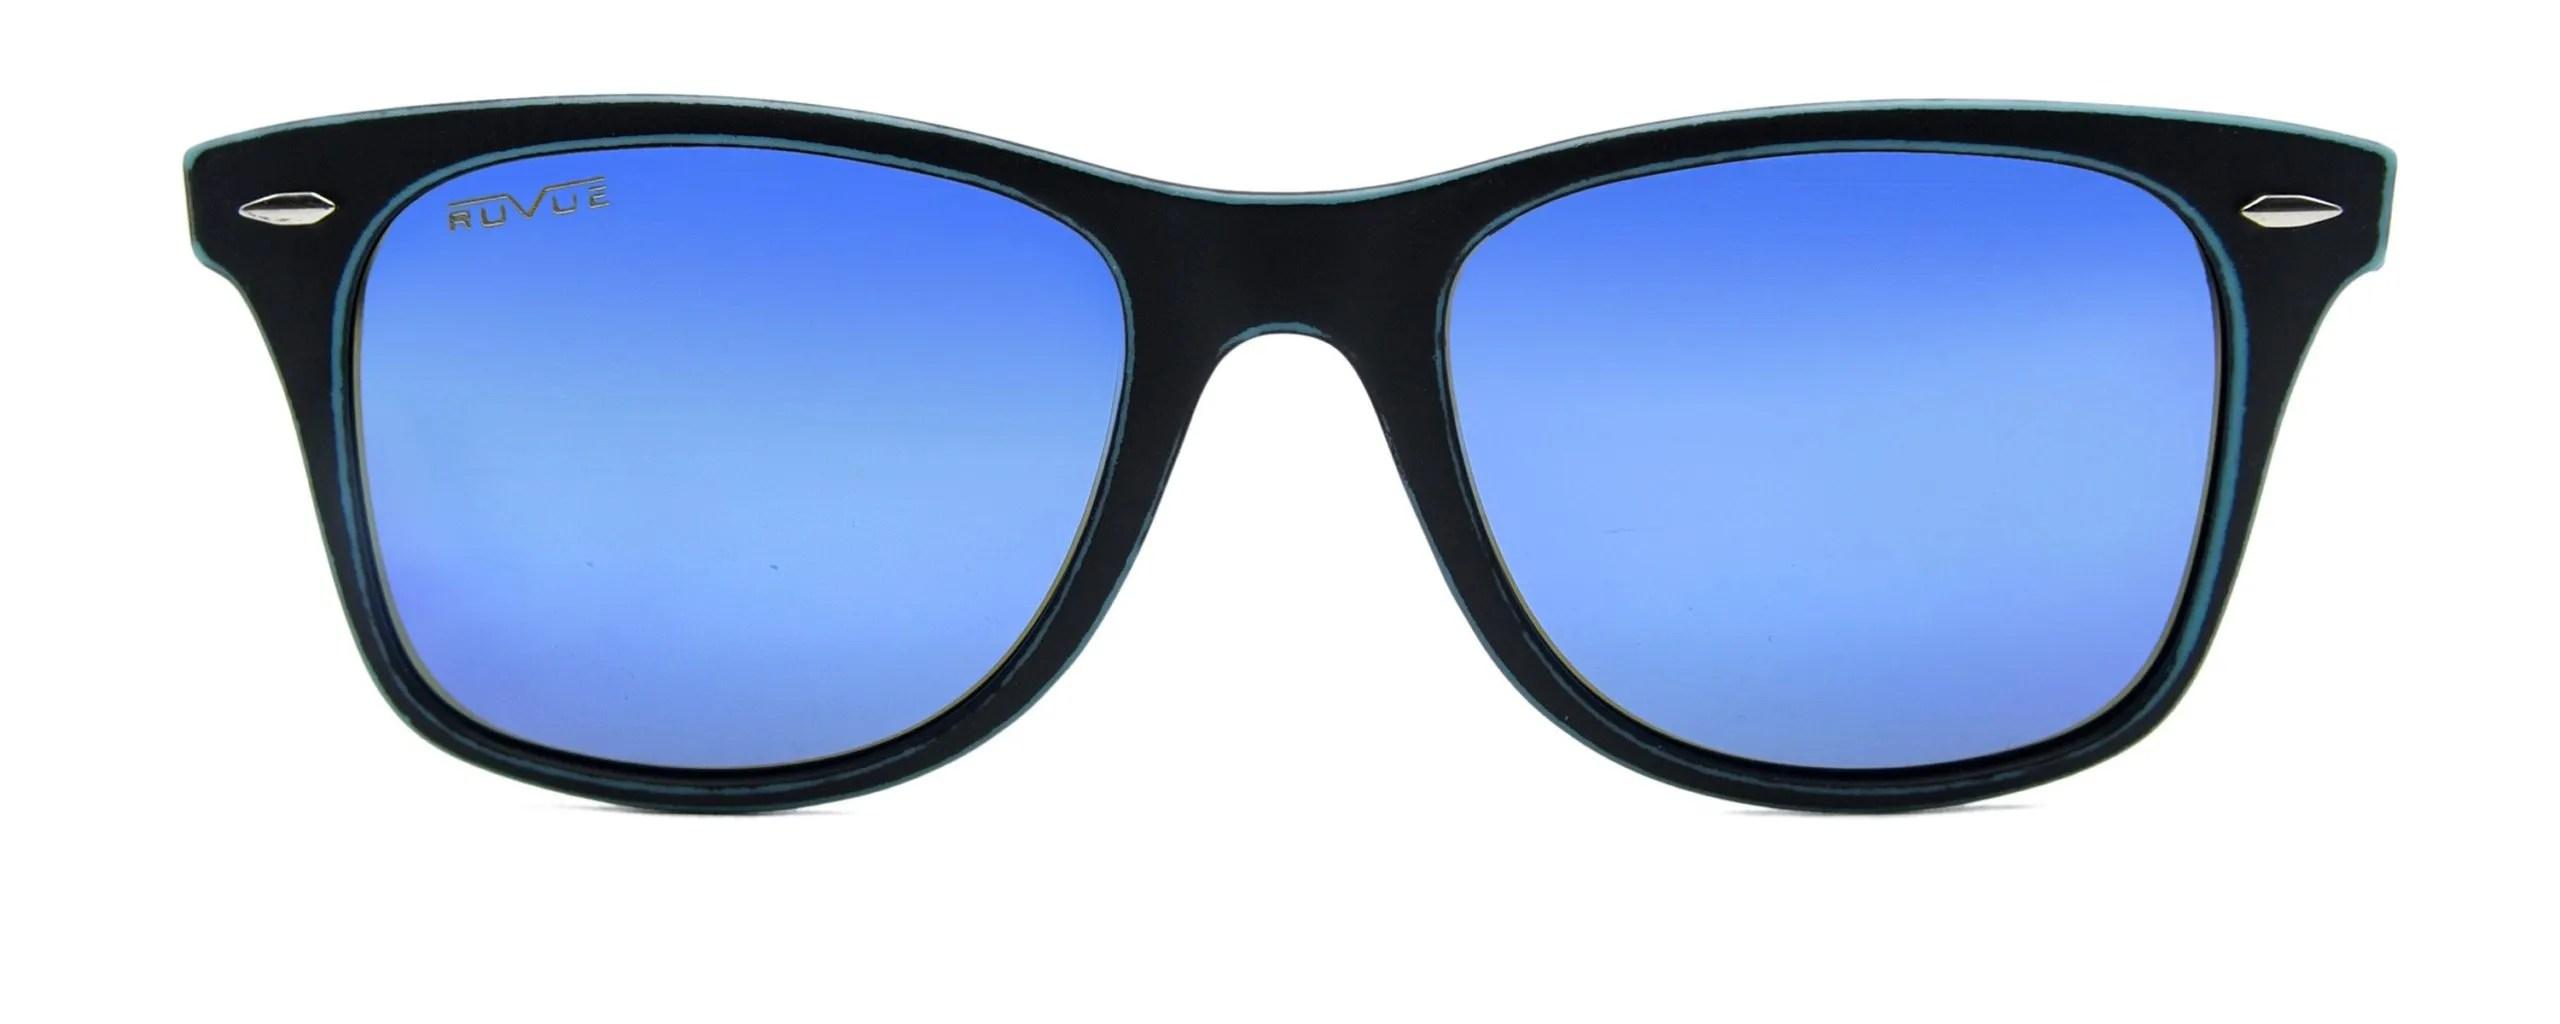 Jude - Matte Black - Blue Polarized Mirror Lenses - Front